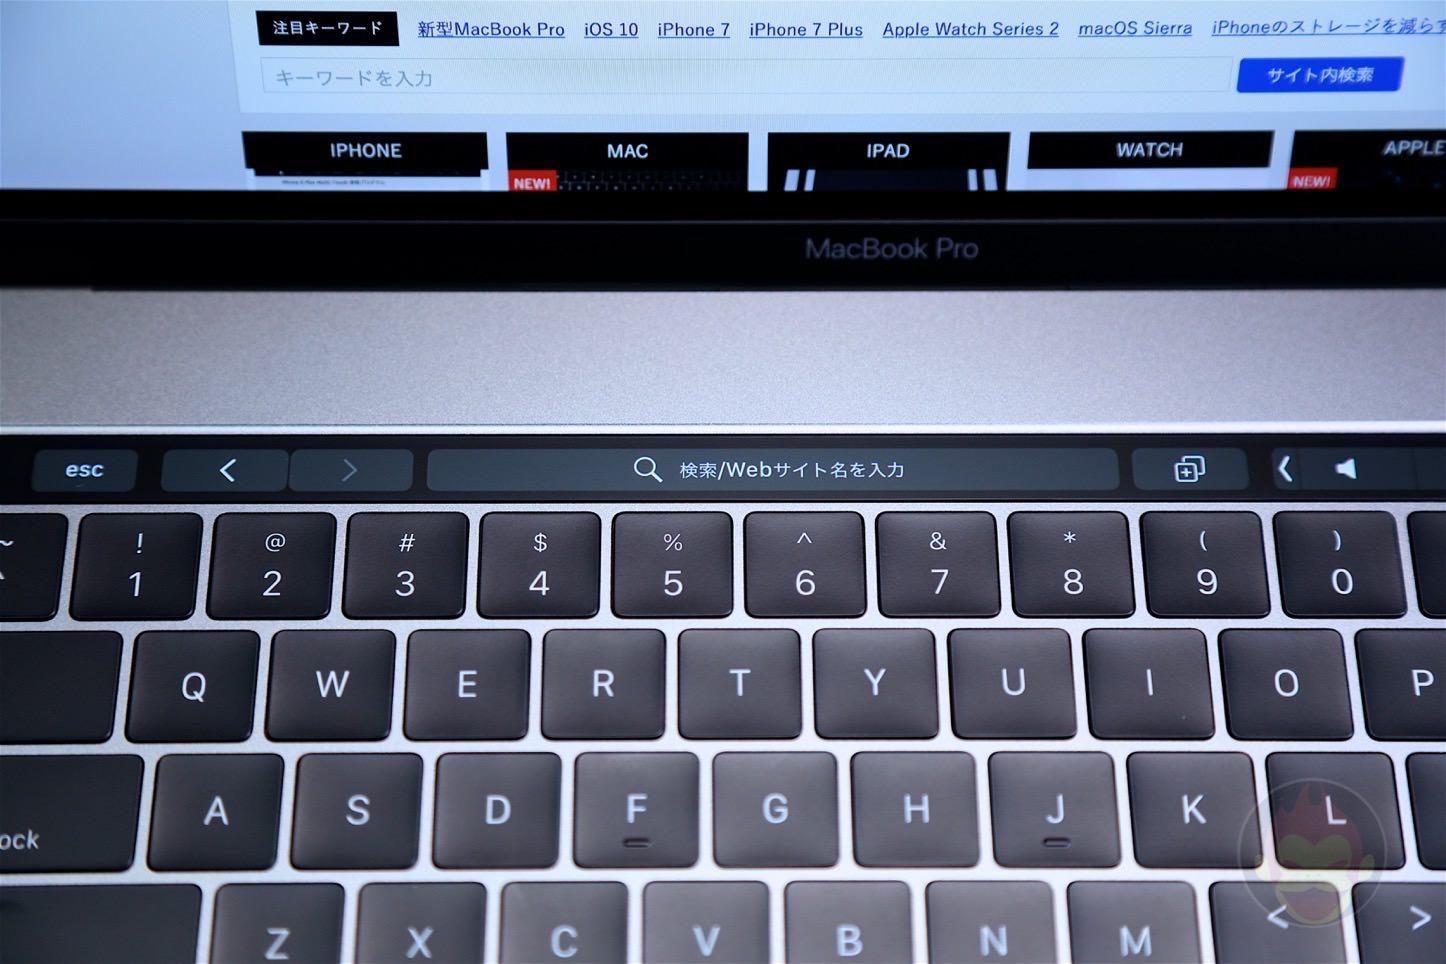 MacBook-Pro-Late-2016-15inch-model-11.jpg